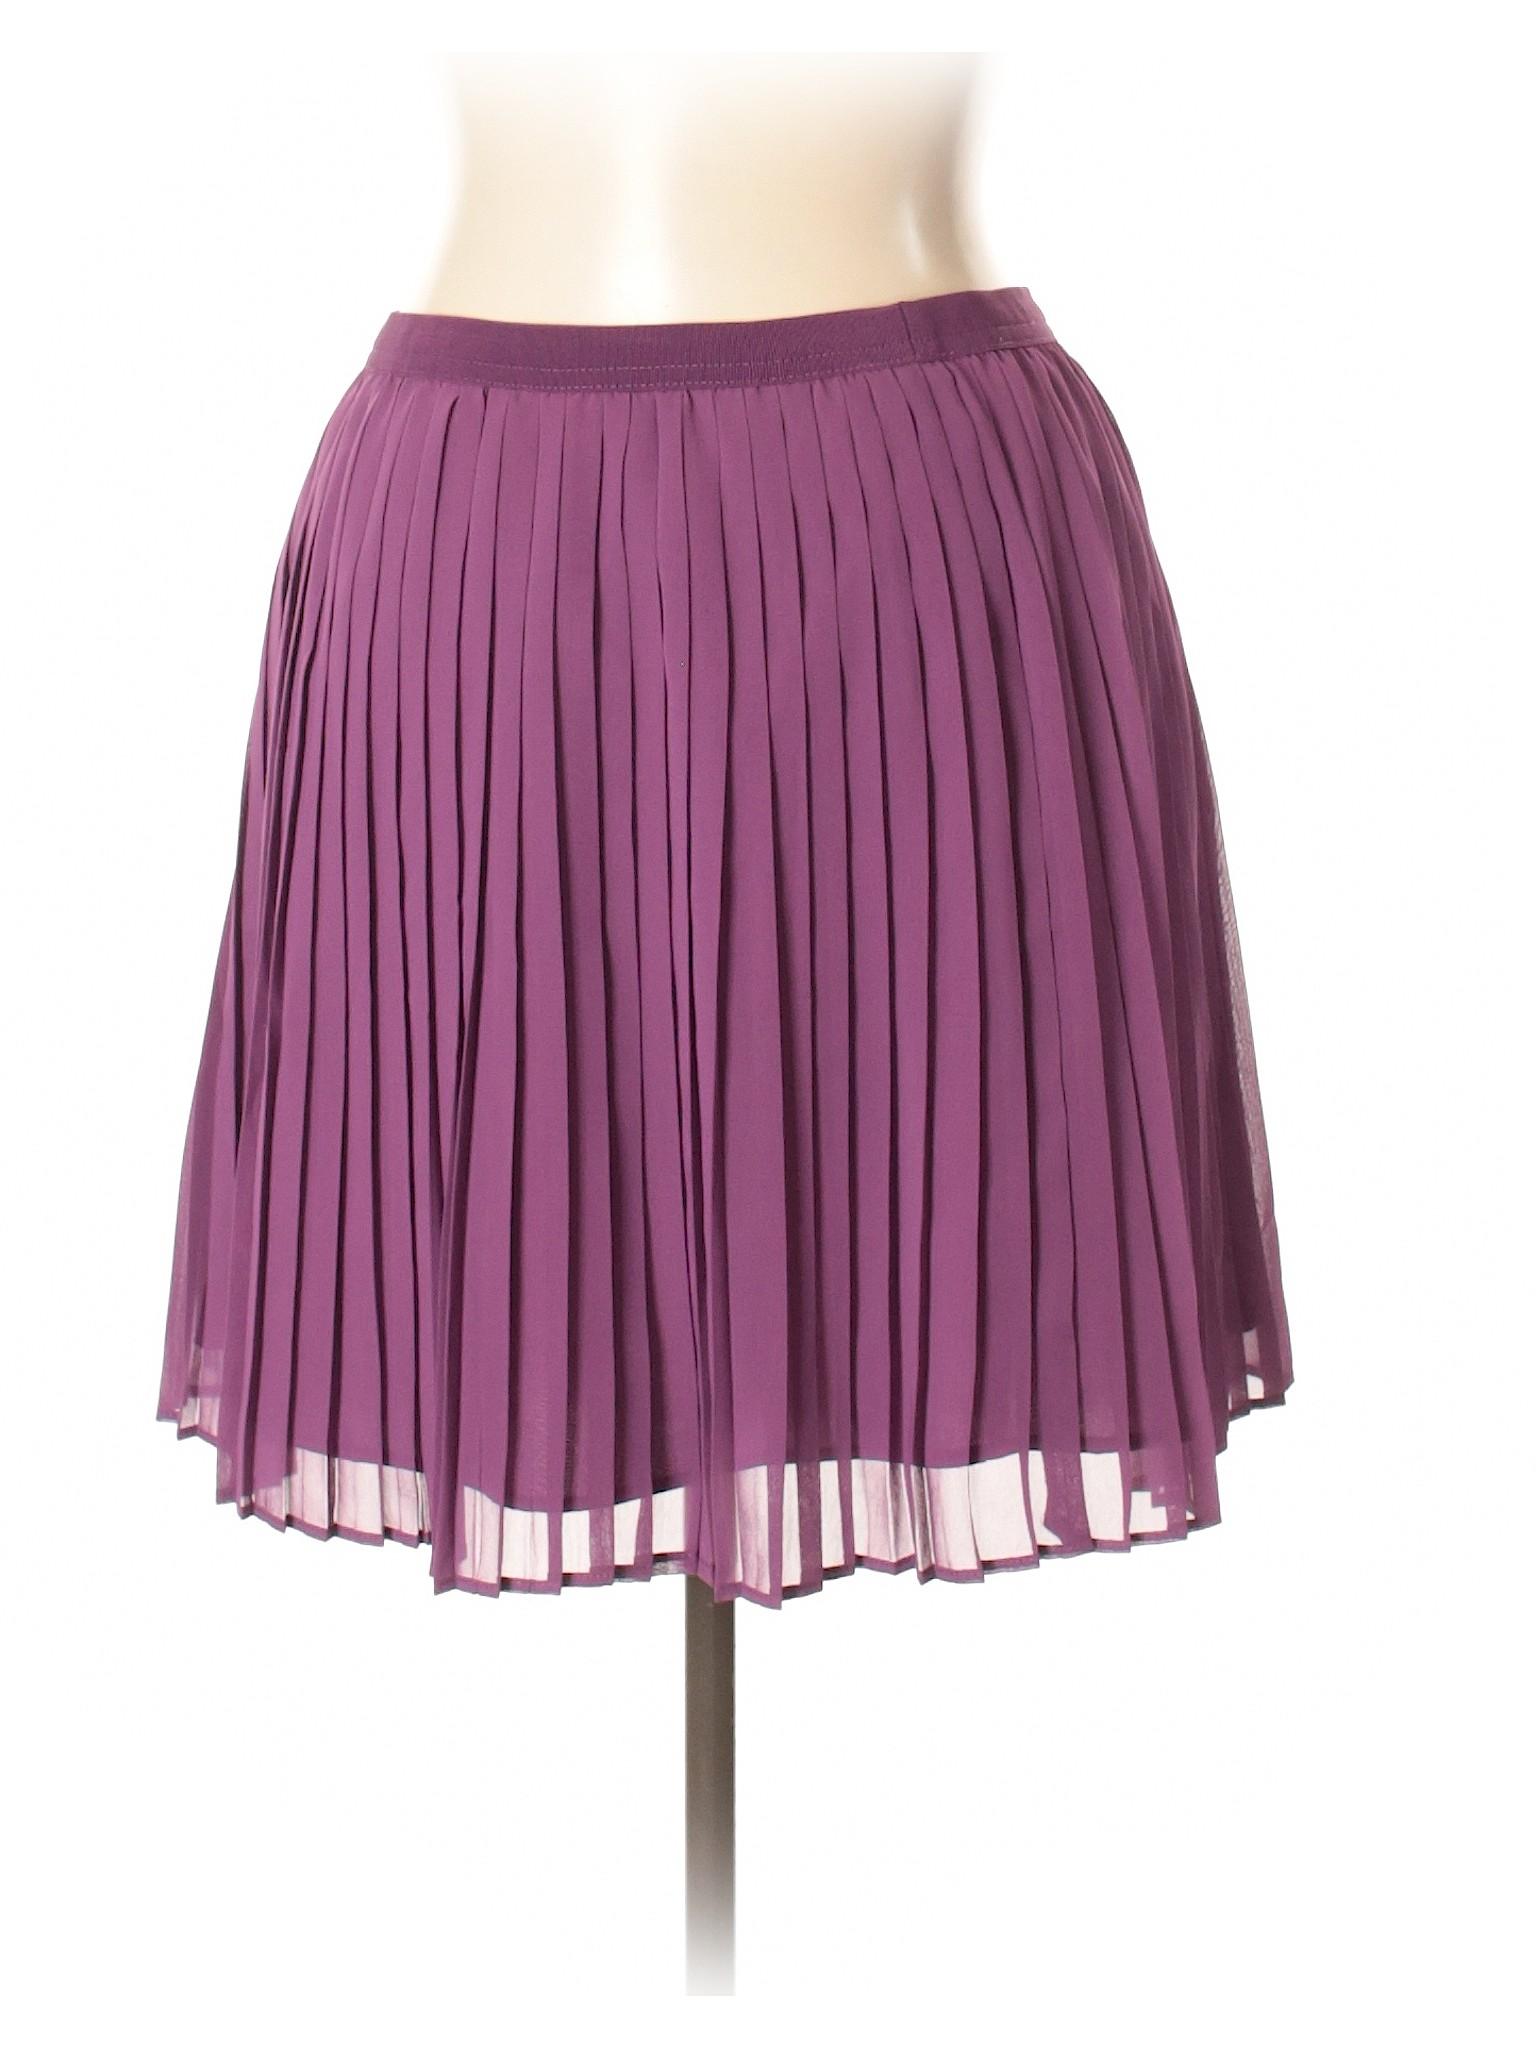 Casual Casual Skirt Skirt Boutique Boutique Boutique Casual vnwZT6